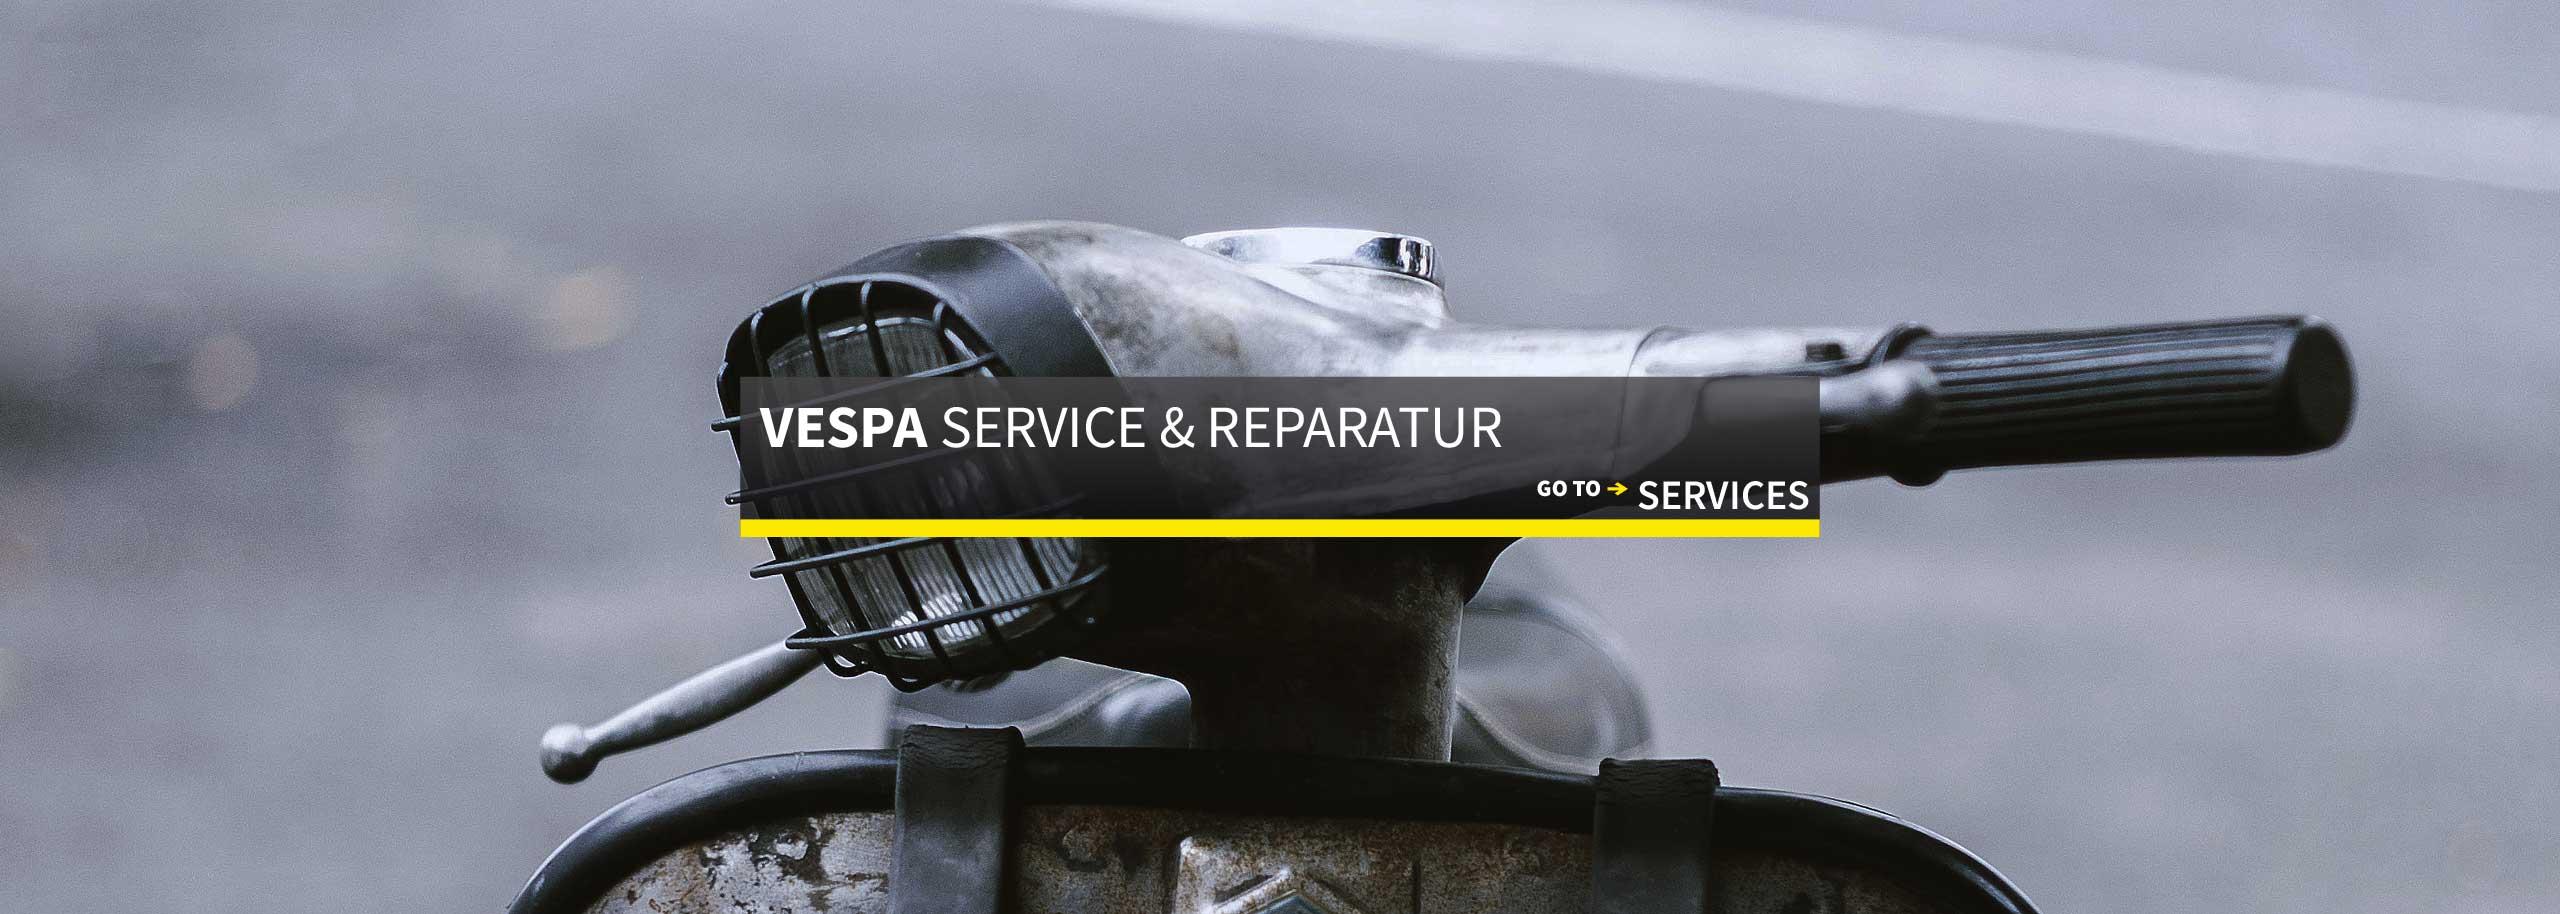 Vespa-Service-Graz-Werner-Legat-Vespa-Maitz-Titan-Motorcycles-Reparatur